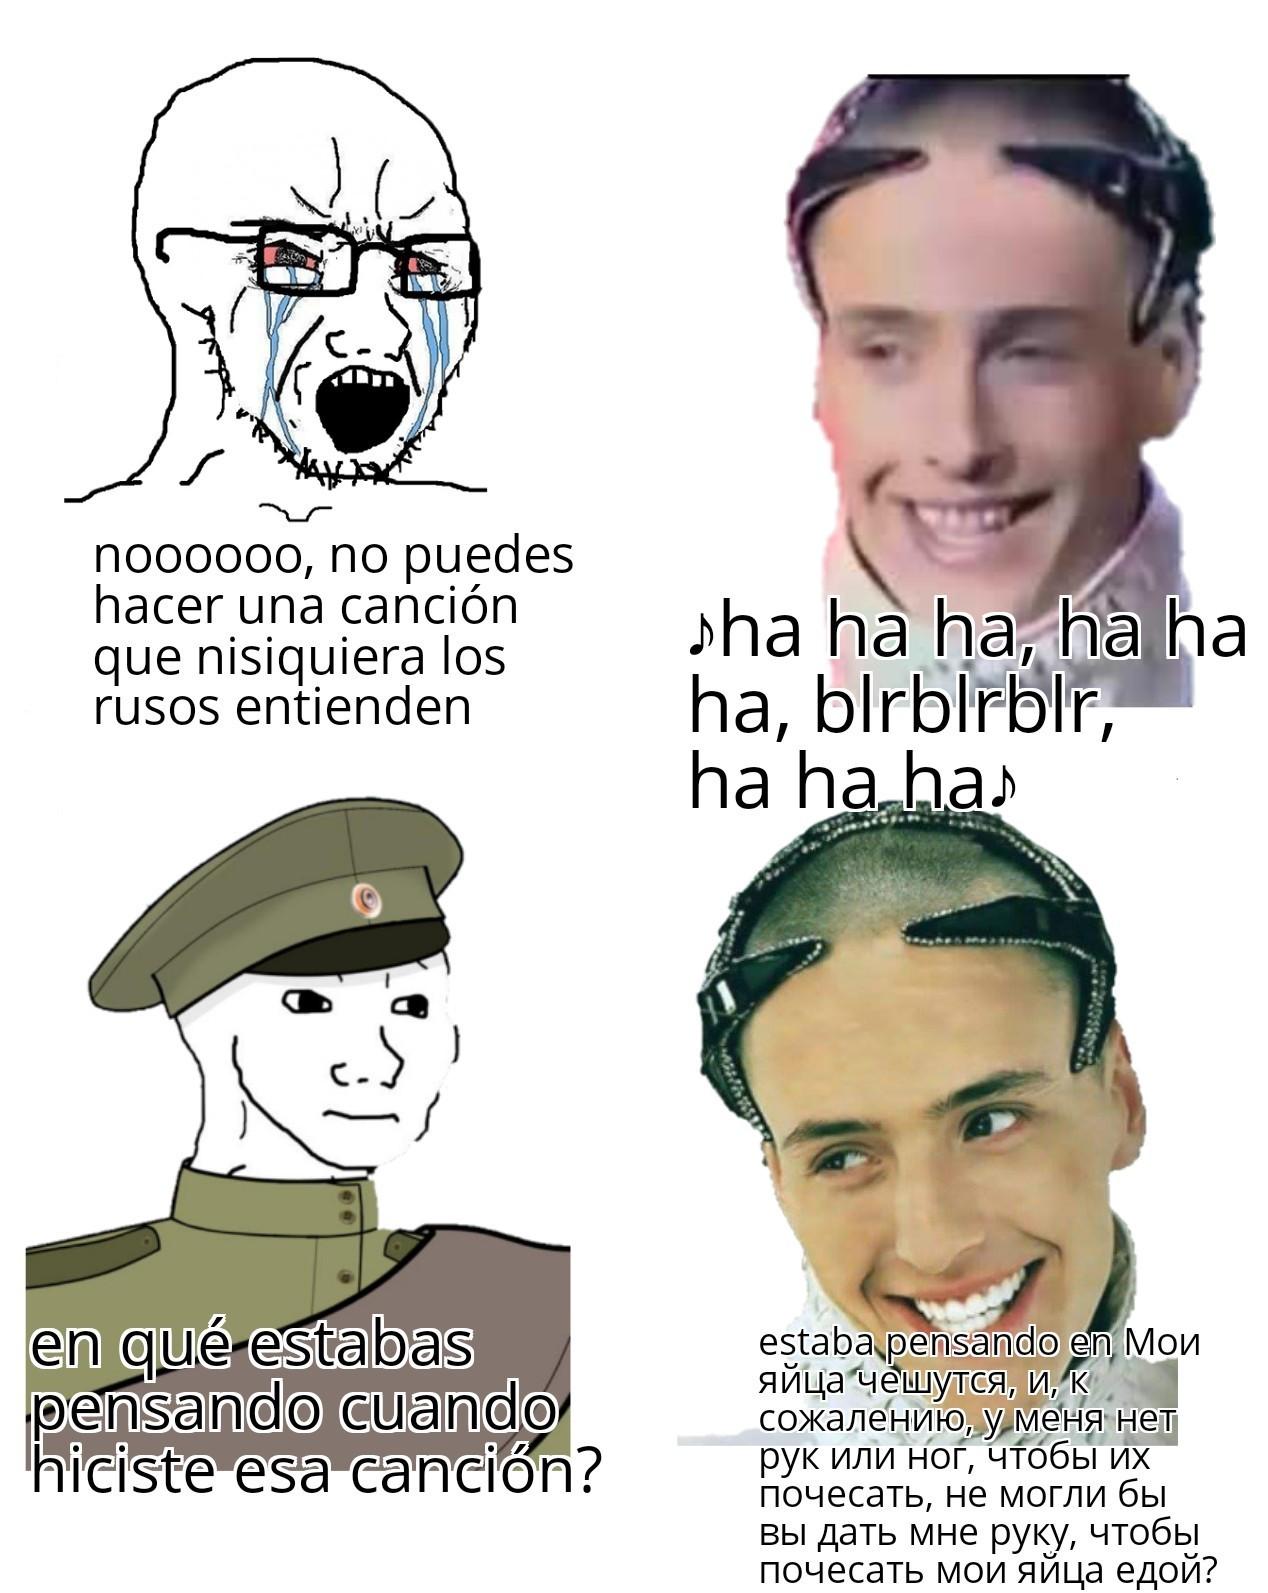 Vitas, the 7th element - meme